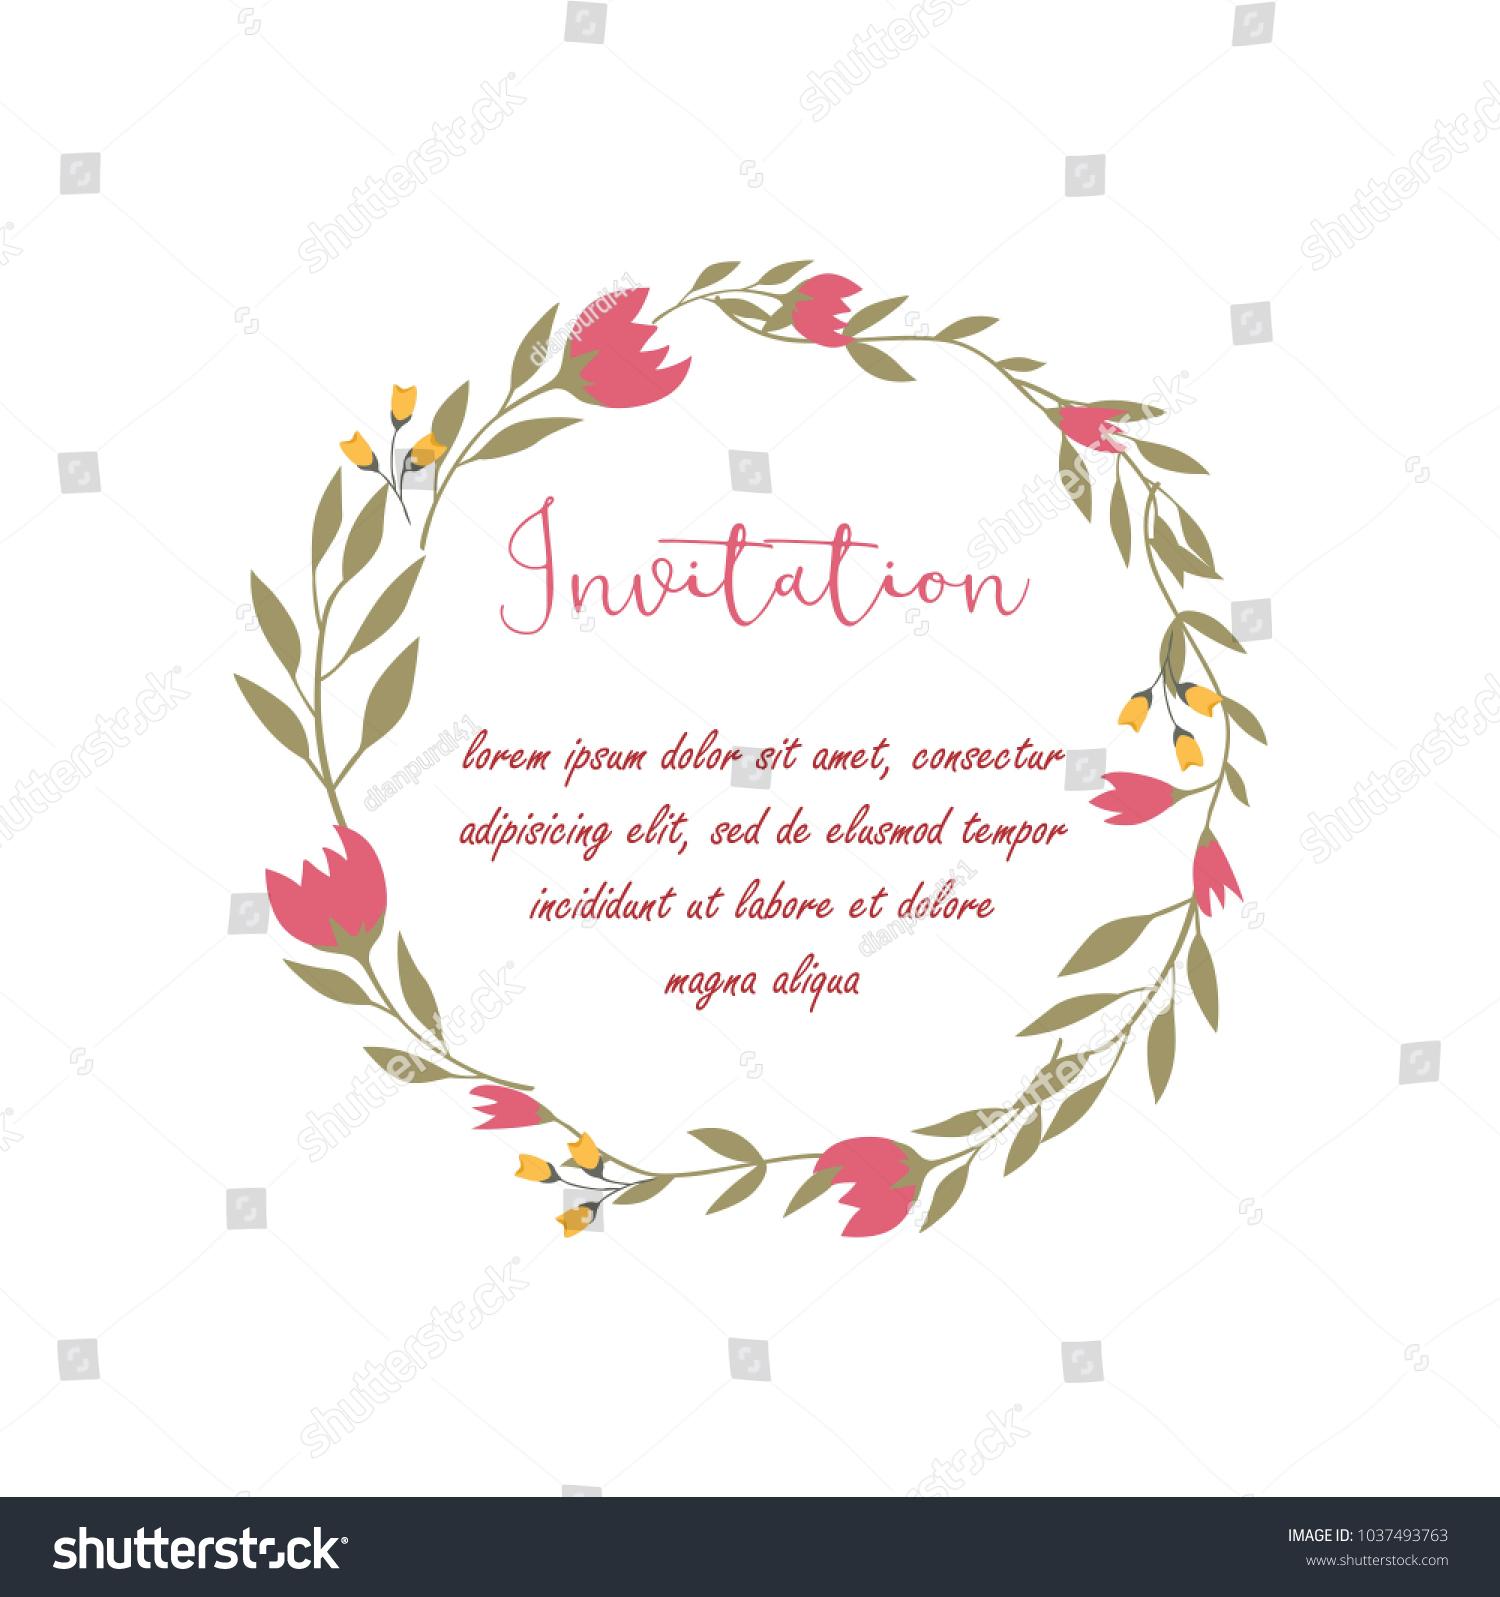 Wedding Anniversary Celebration Invitation Card Template Stock ...